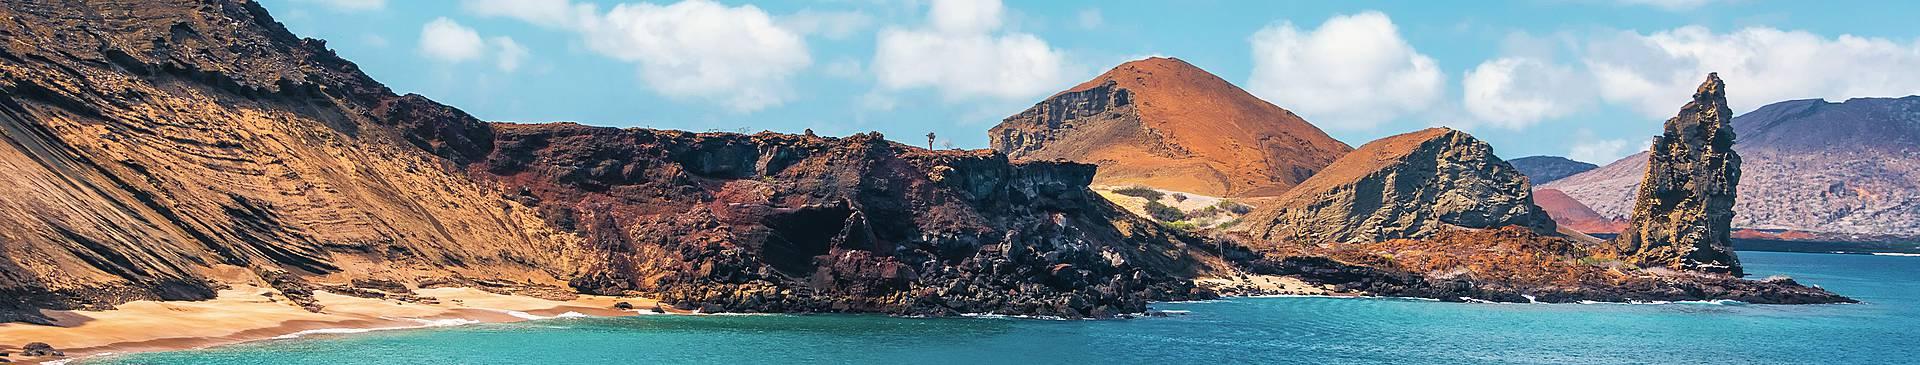 Voyage plage dans les îles Galapagos